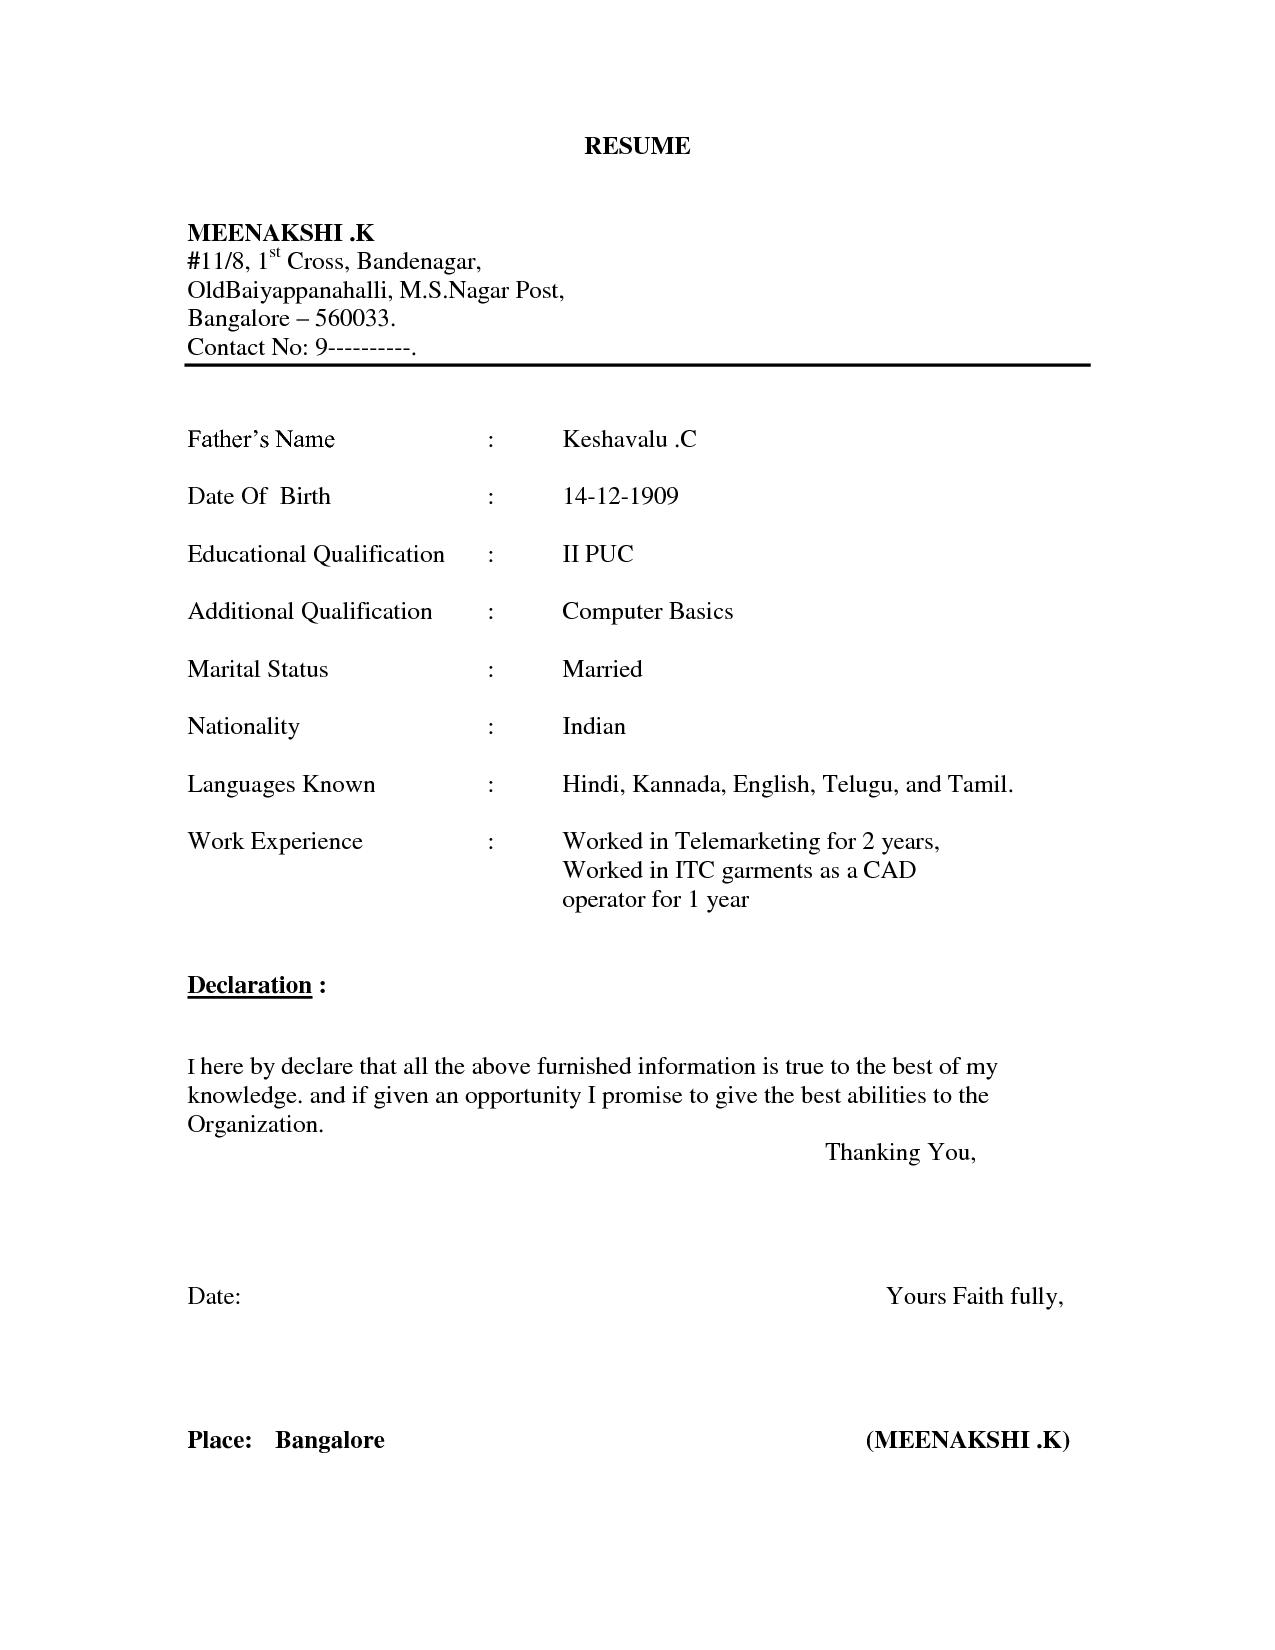 Samples of simple resumes